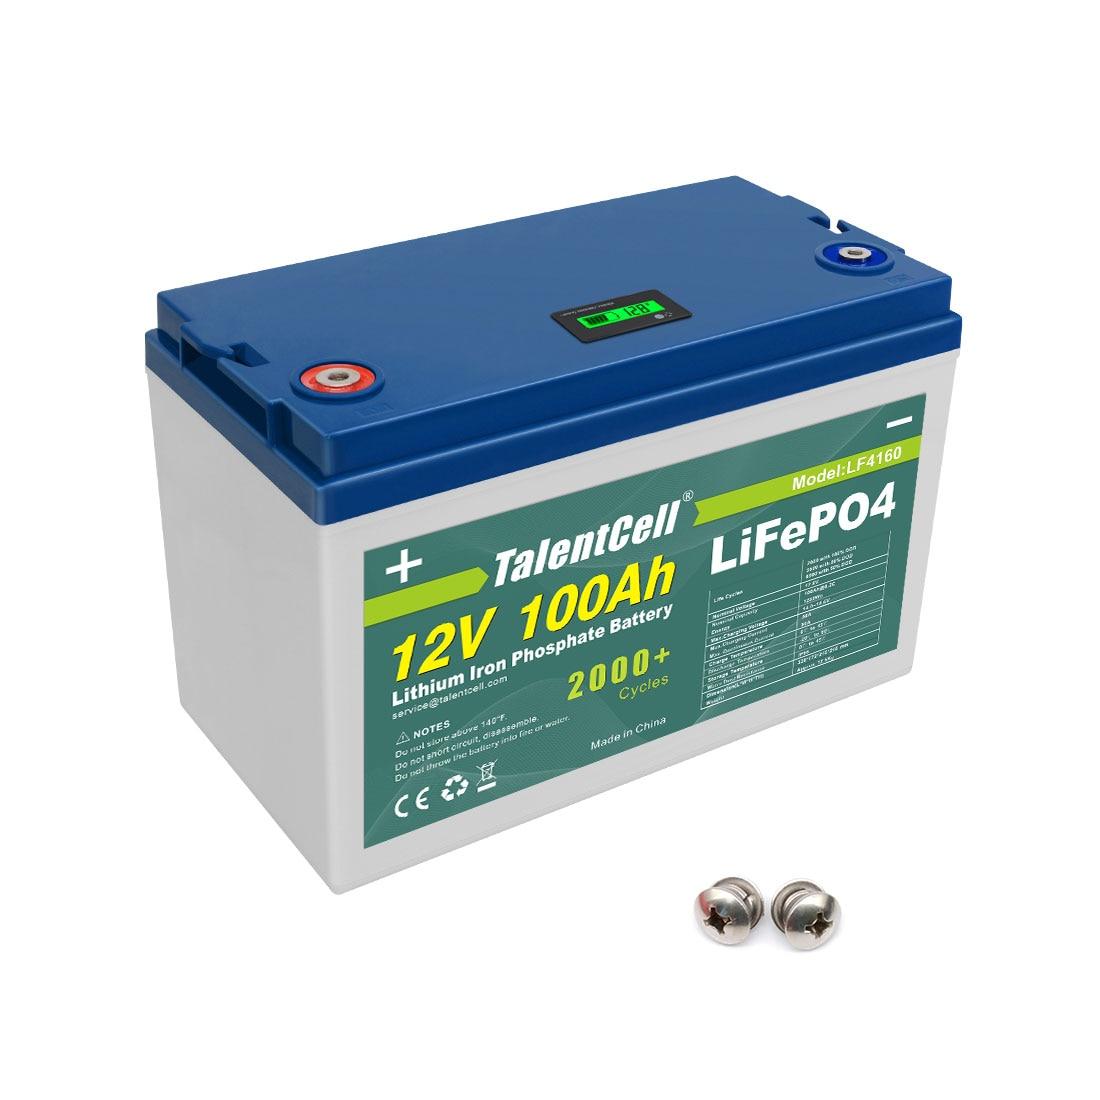 RTS LiFePO4 بطارية 32700 قابلة للشحن 12 فولت 100 أمبير دورة عميقة ليثيوم الحديد الفوسفات